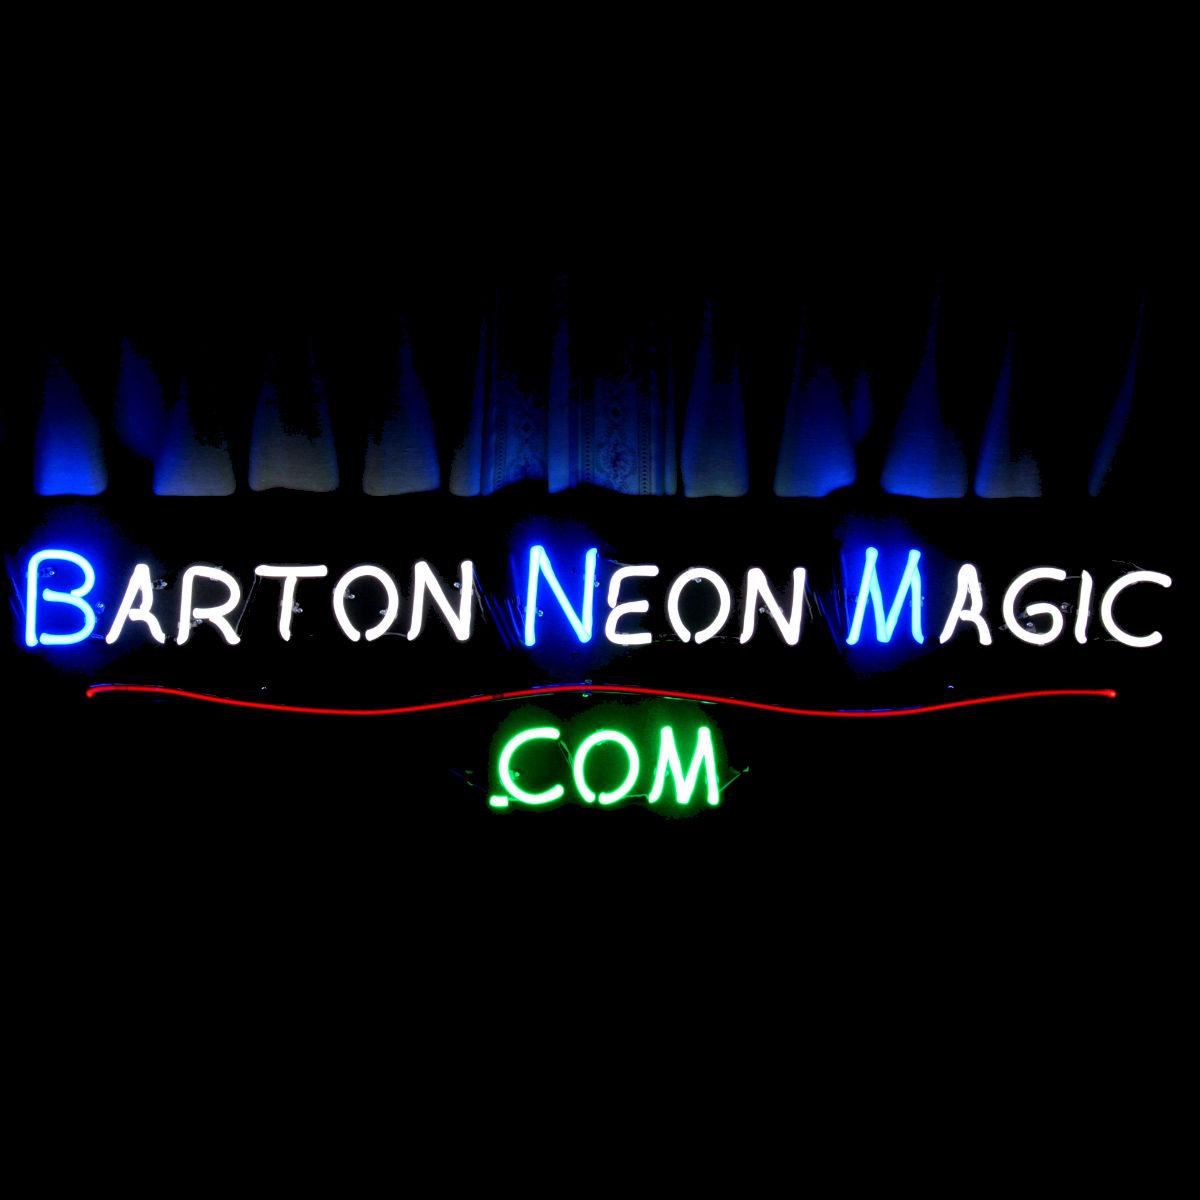 Great Gifts for Pilots - Dazzling Custom Neon Light Sculptures by John Barton - Famous USA Neon Glass Artist - BartonNeonMagic.com